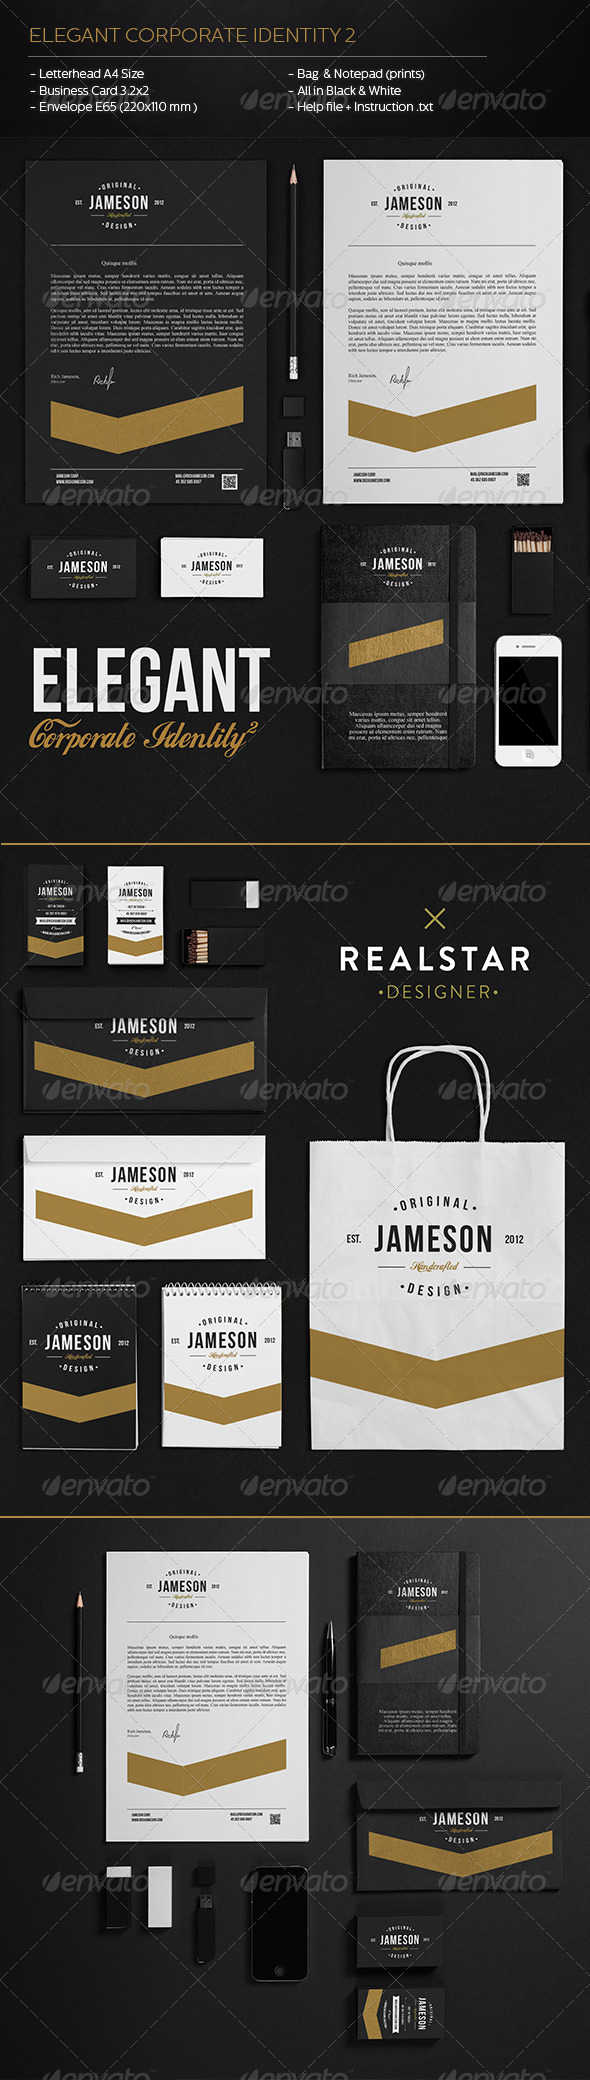 Elegant Corporate Identity 2